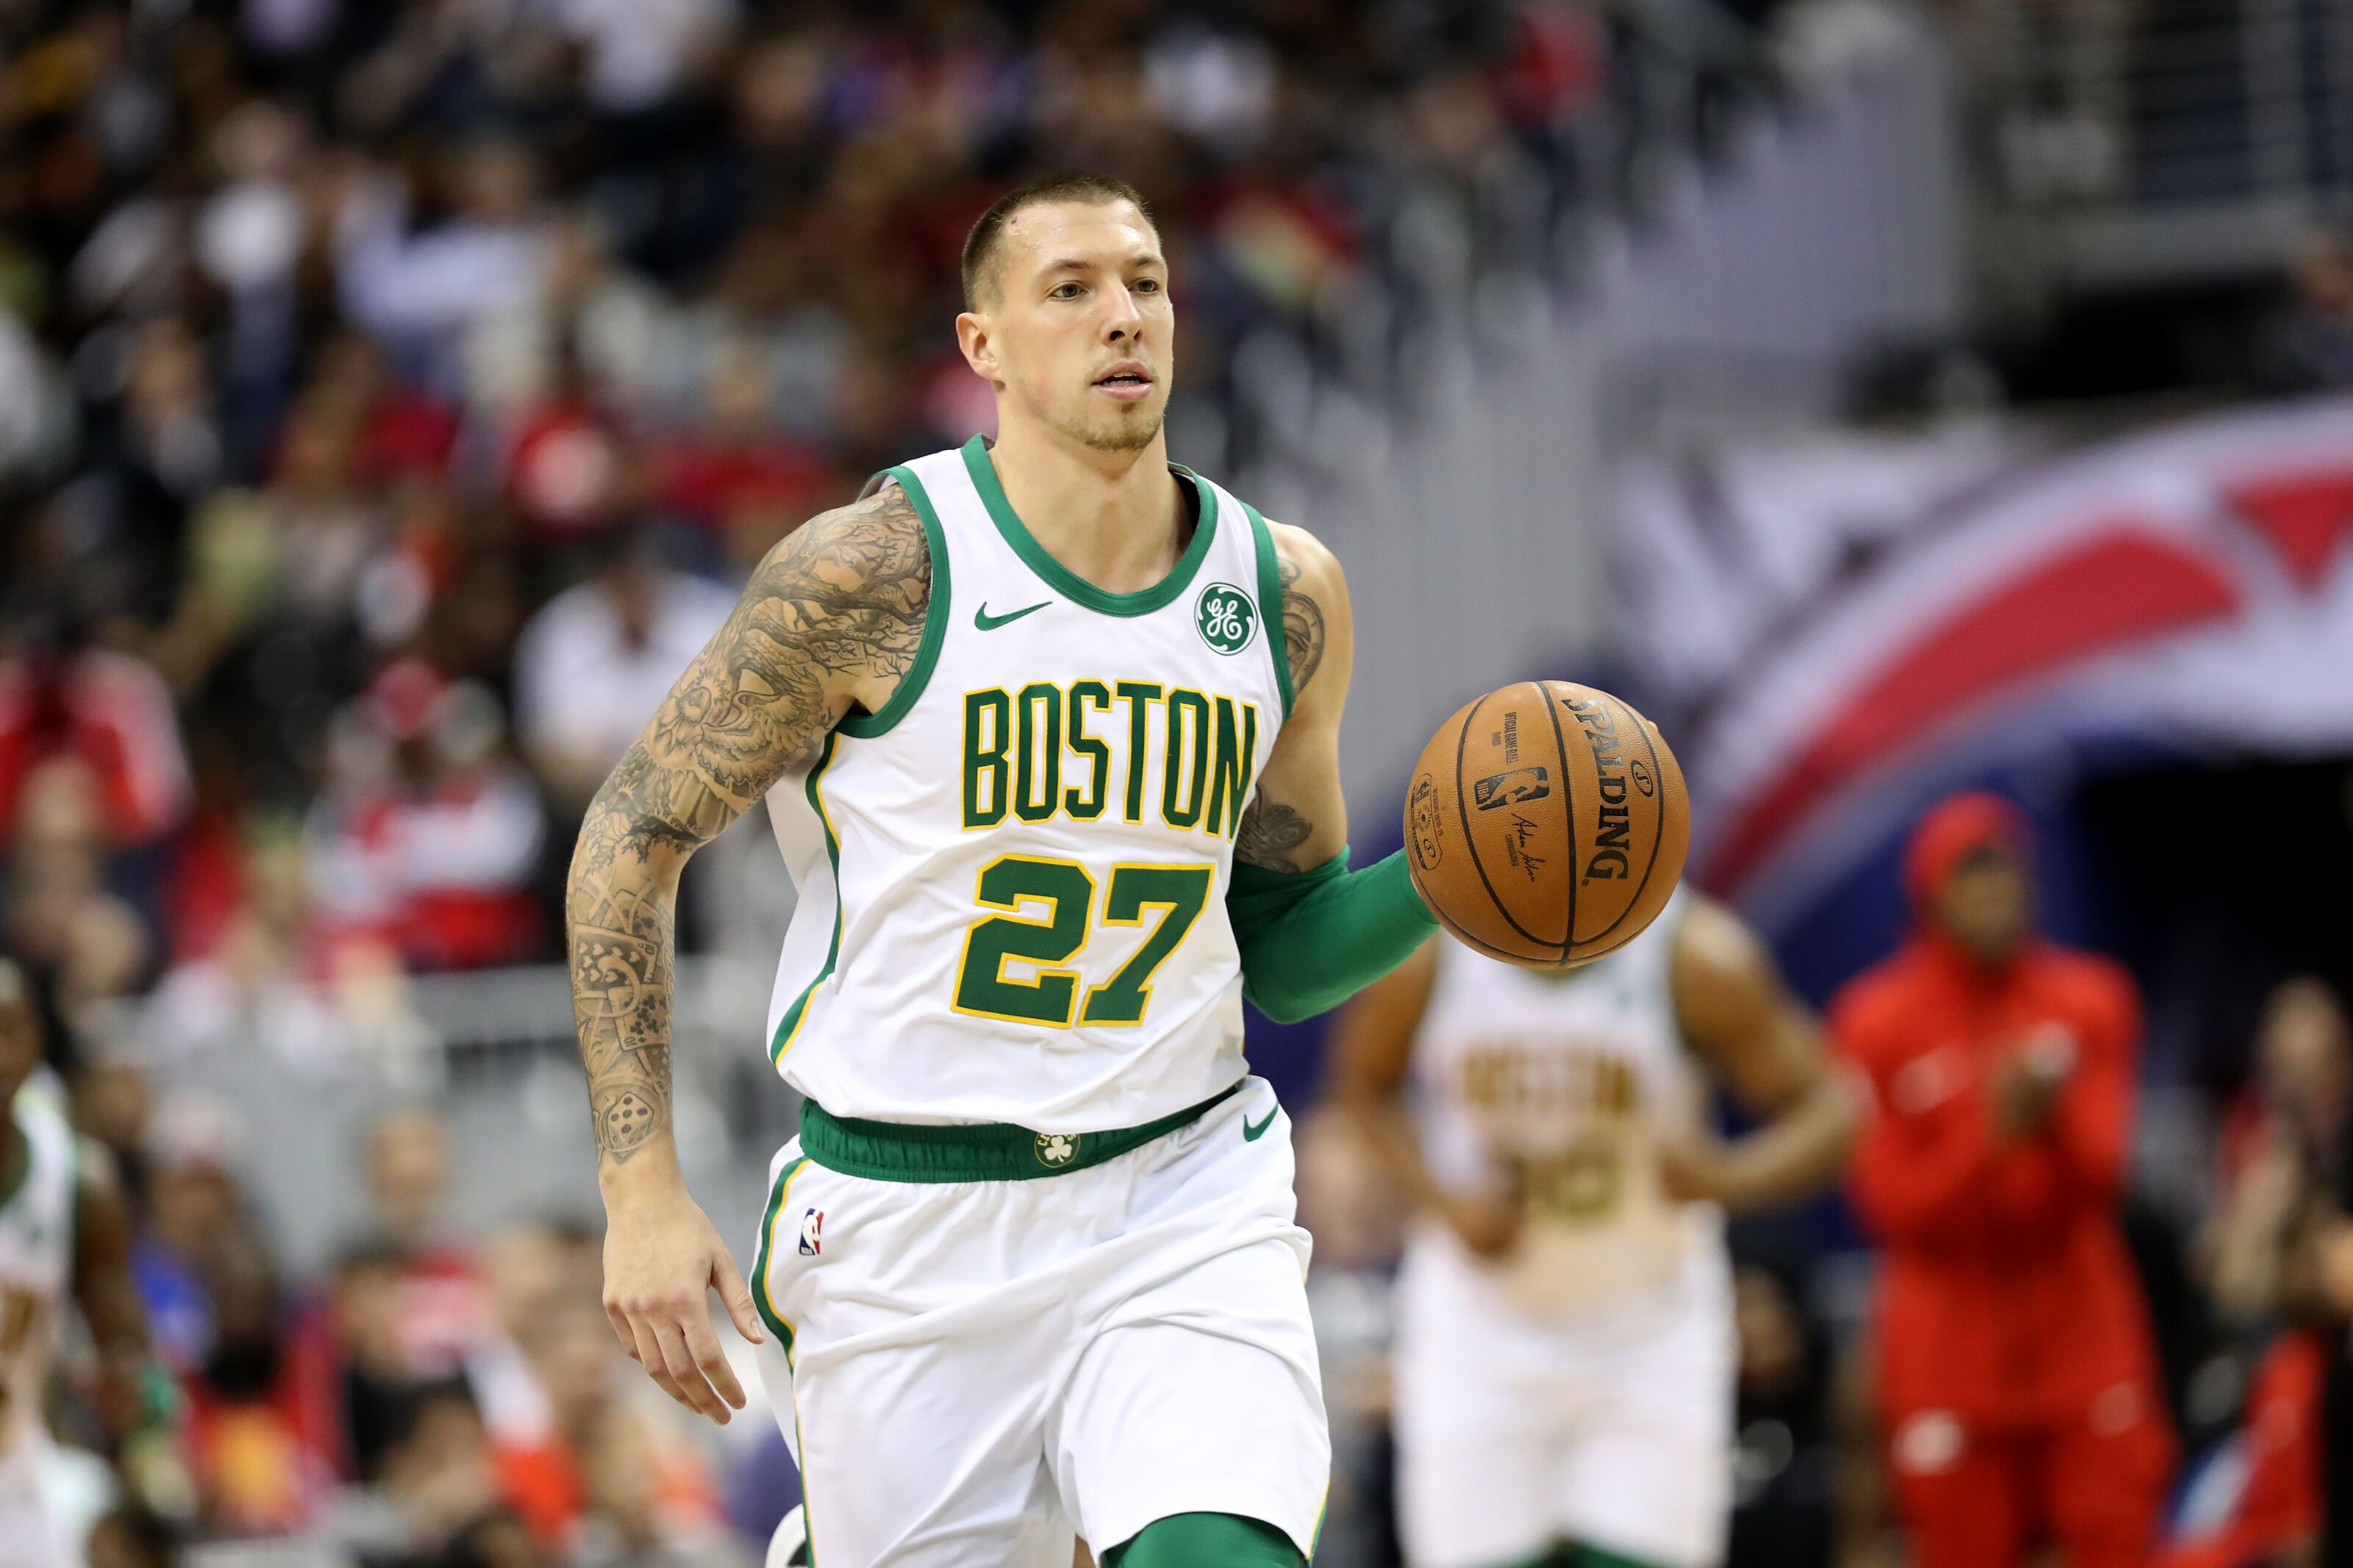 Boston Celtics: Daniel Theis unsung hero in first quarter of 2019-20 season